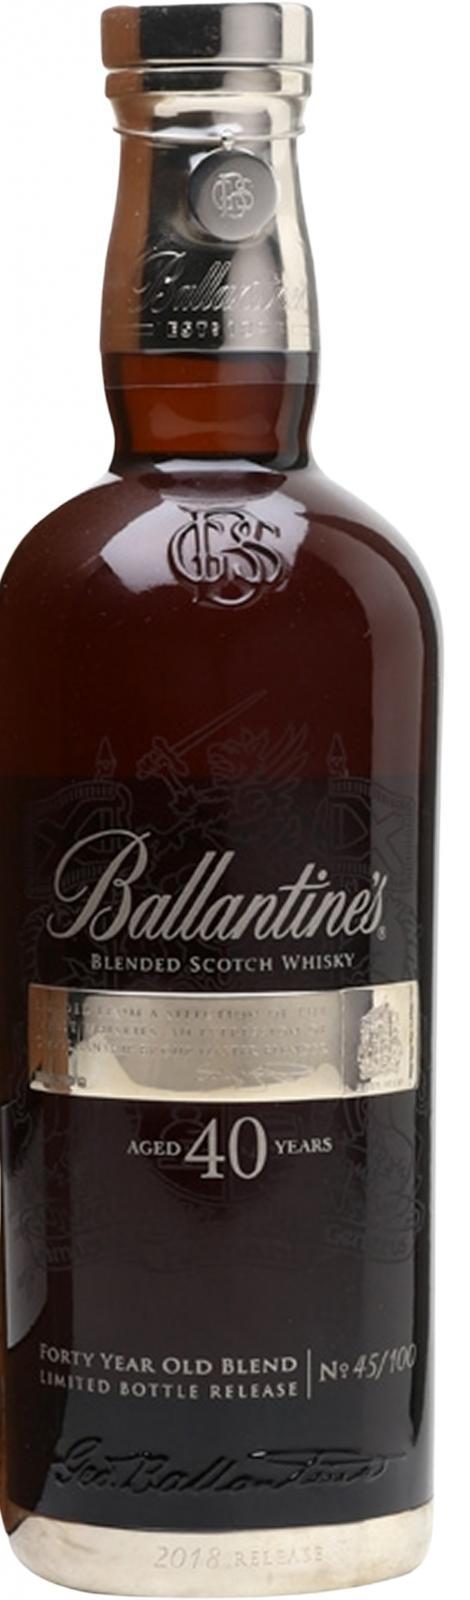 Ballantine's 40-year-old